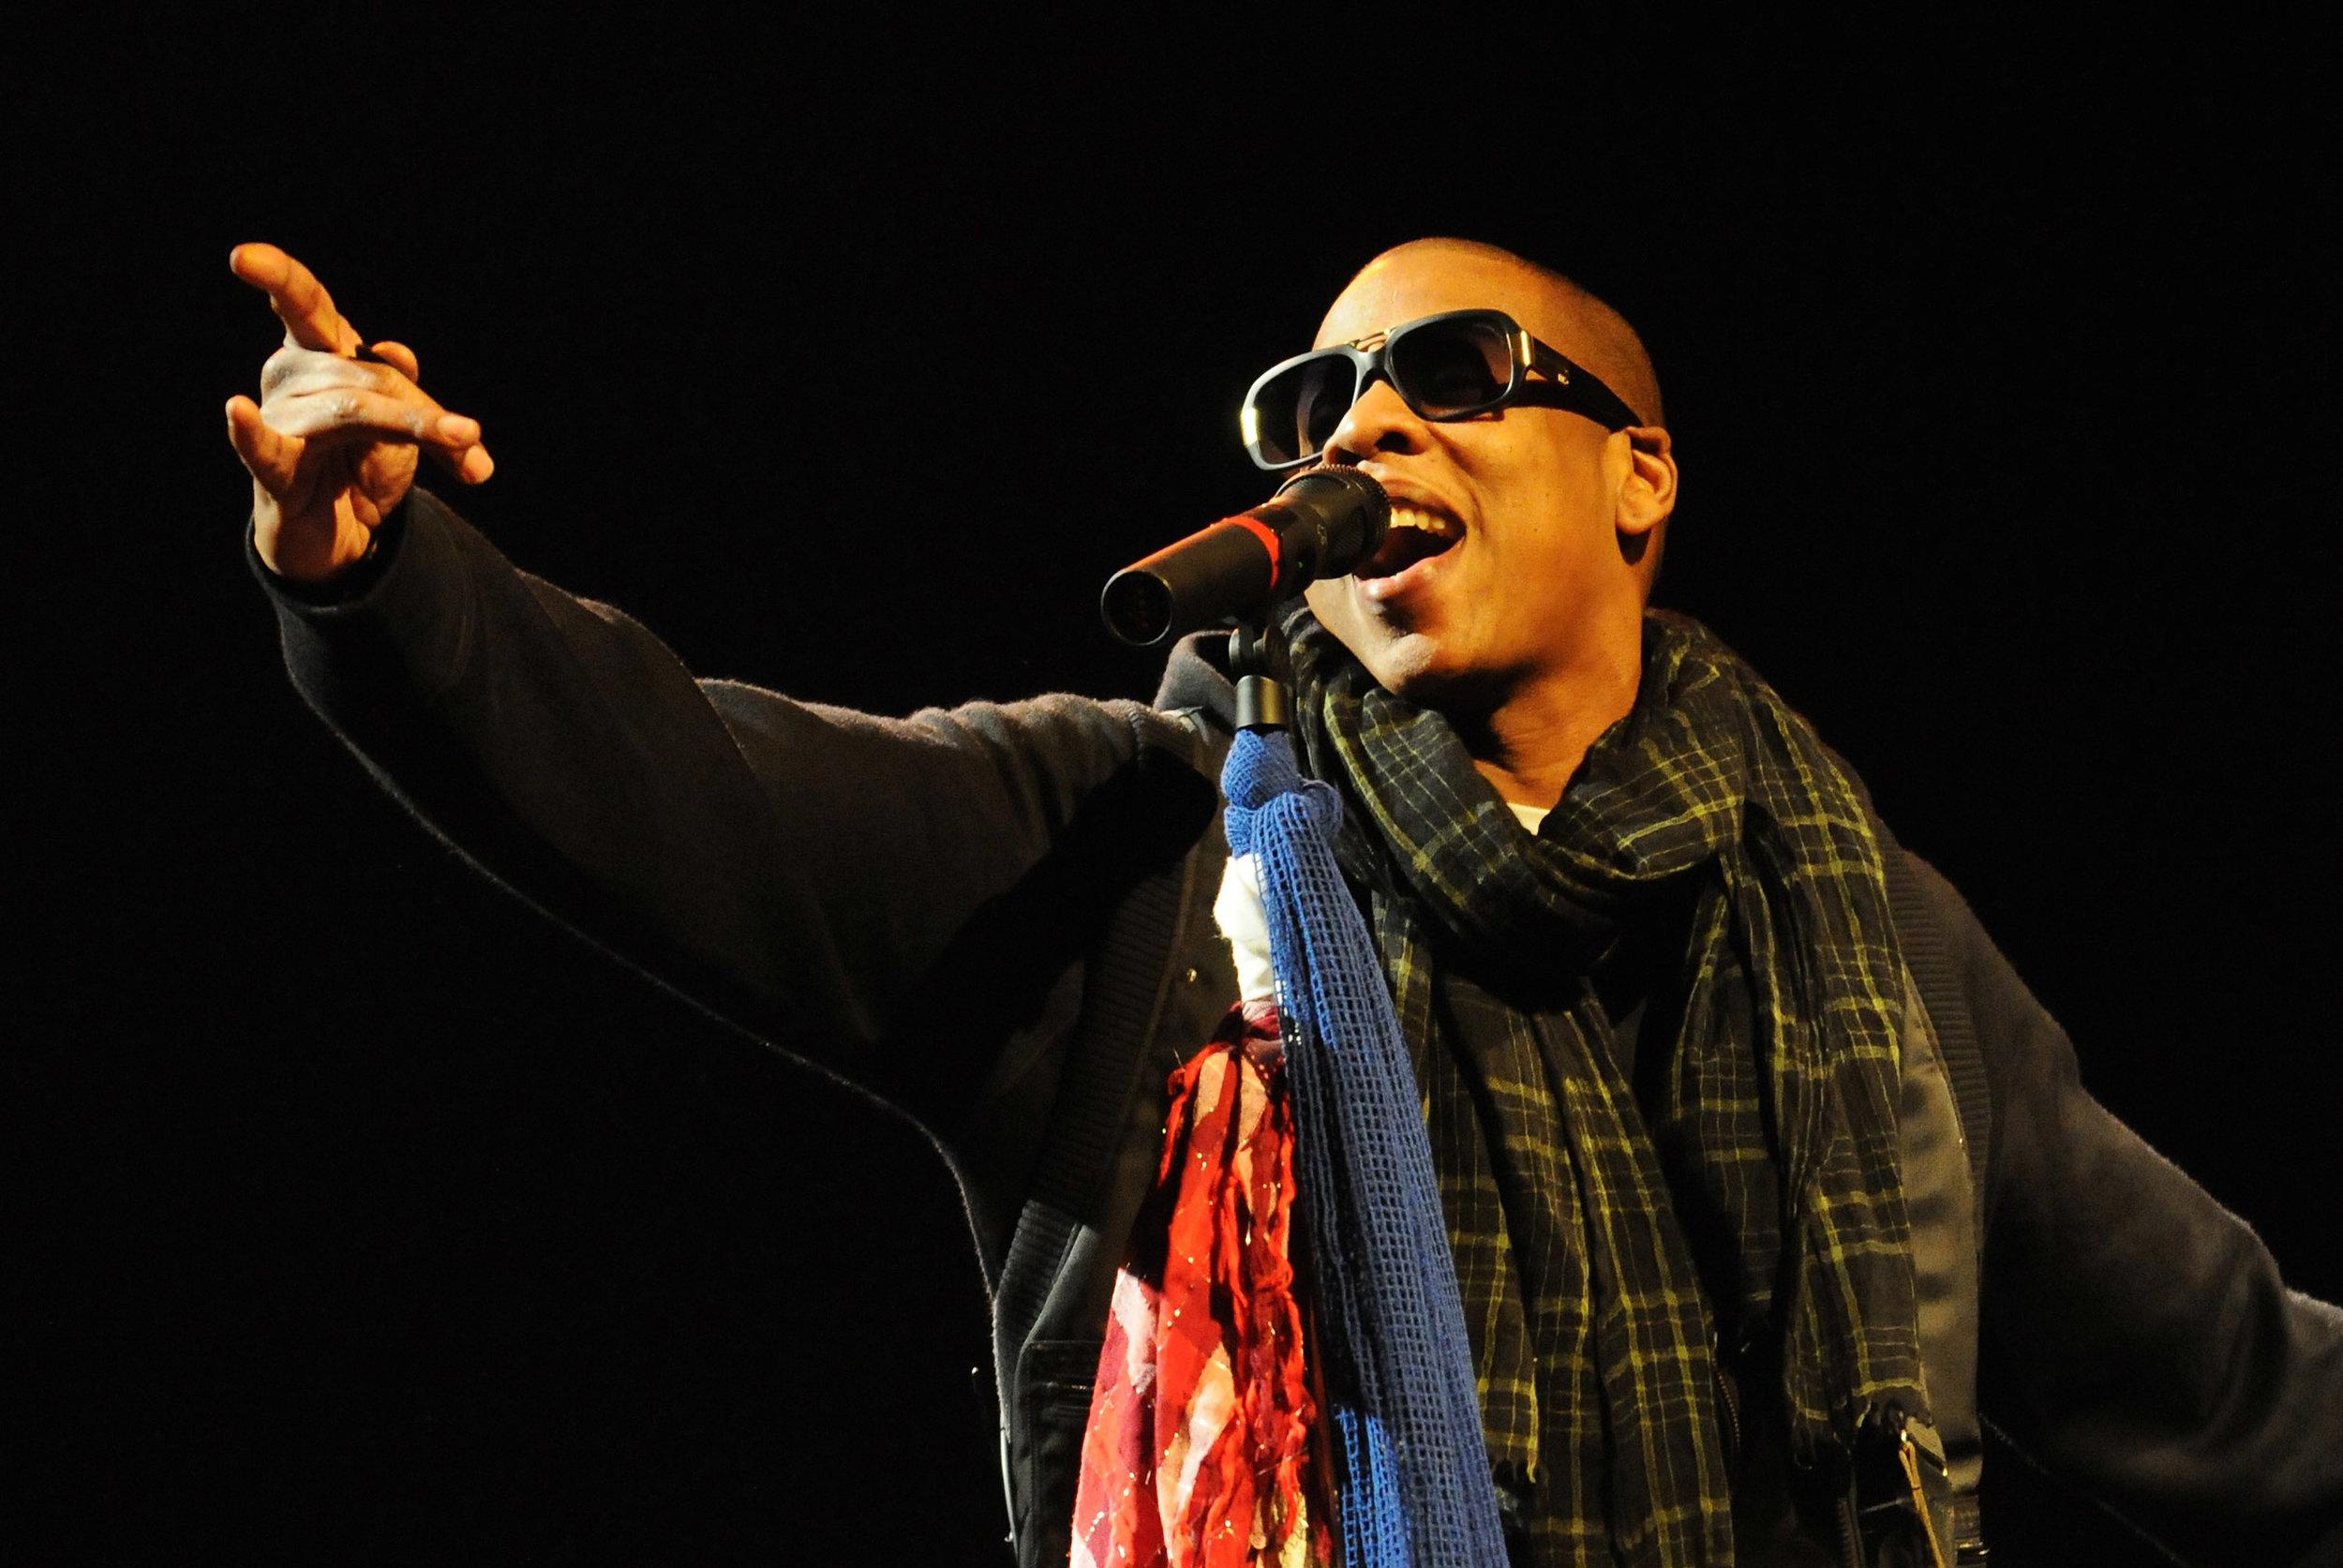 Jay-Z performing at Glastonbury. Photo by Jim Dyson